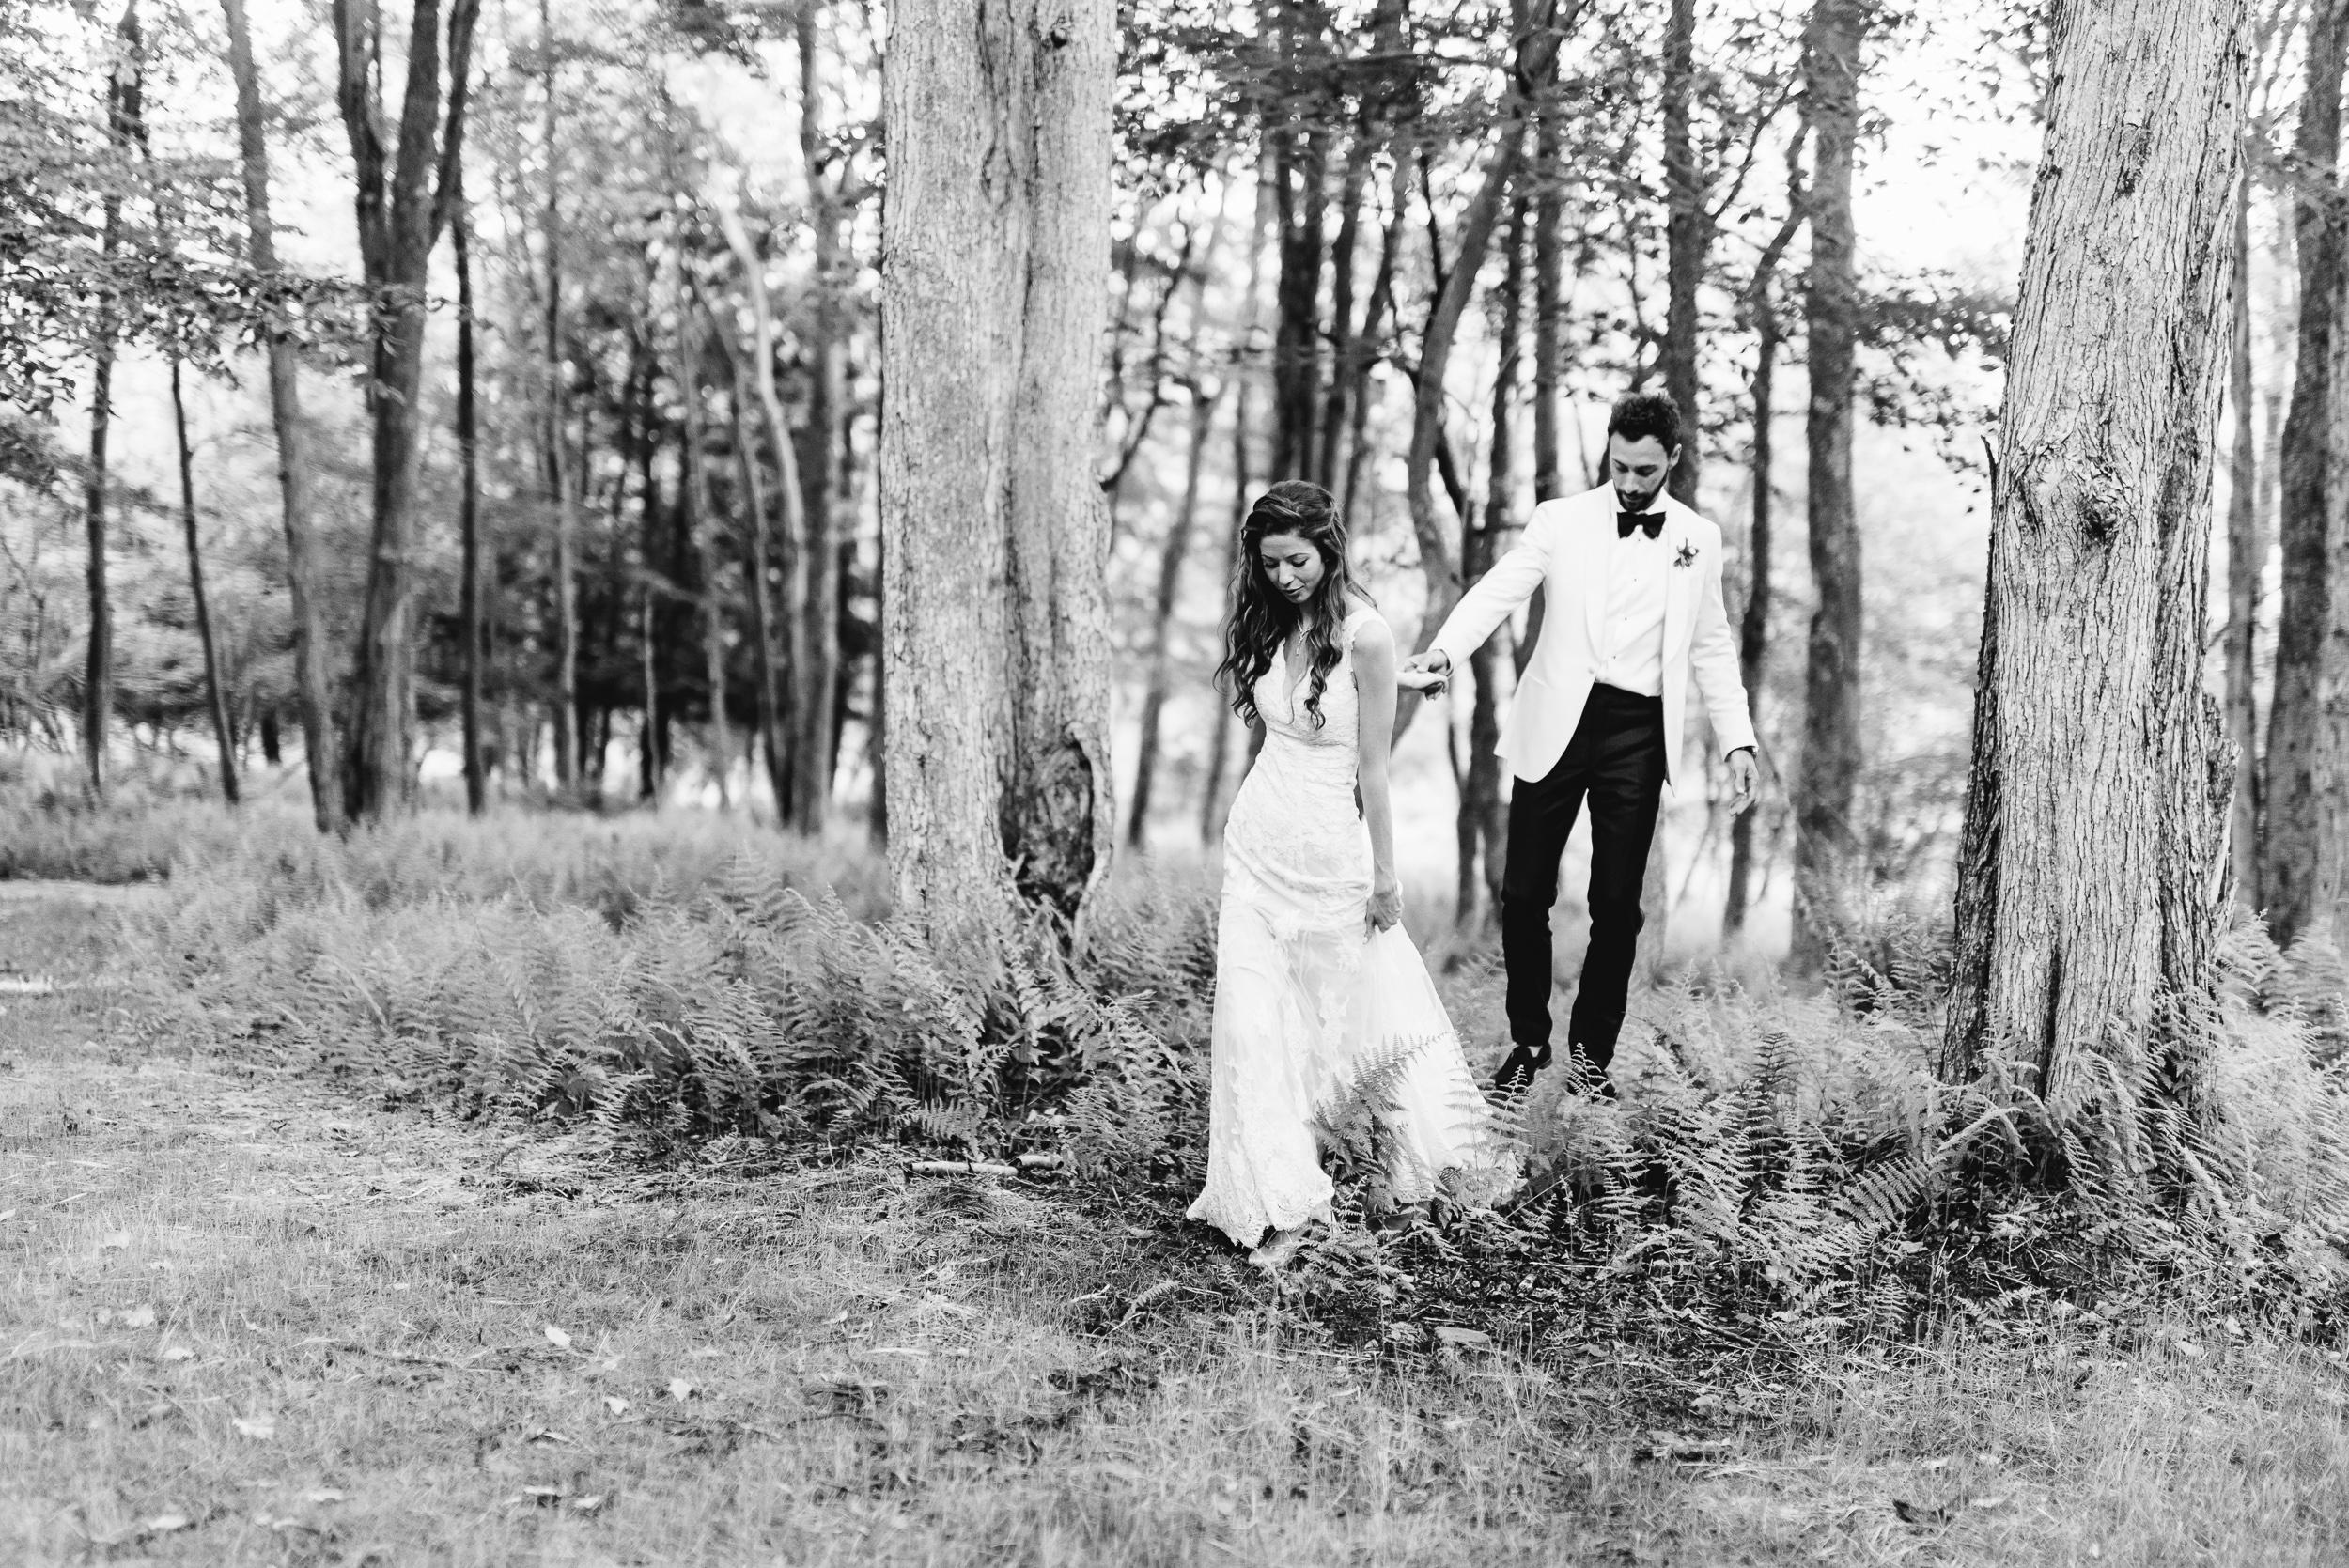 063-Handsome Hollow Wedding Photos Handsome Hollow Wedding Air BNB Wedding Brooklyn Wedding Photographer.jpg